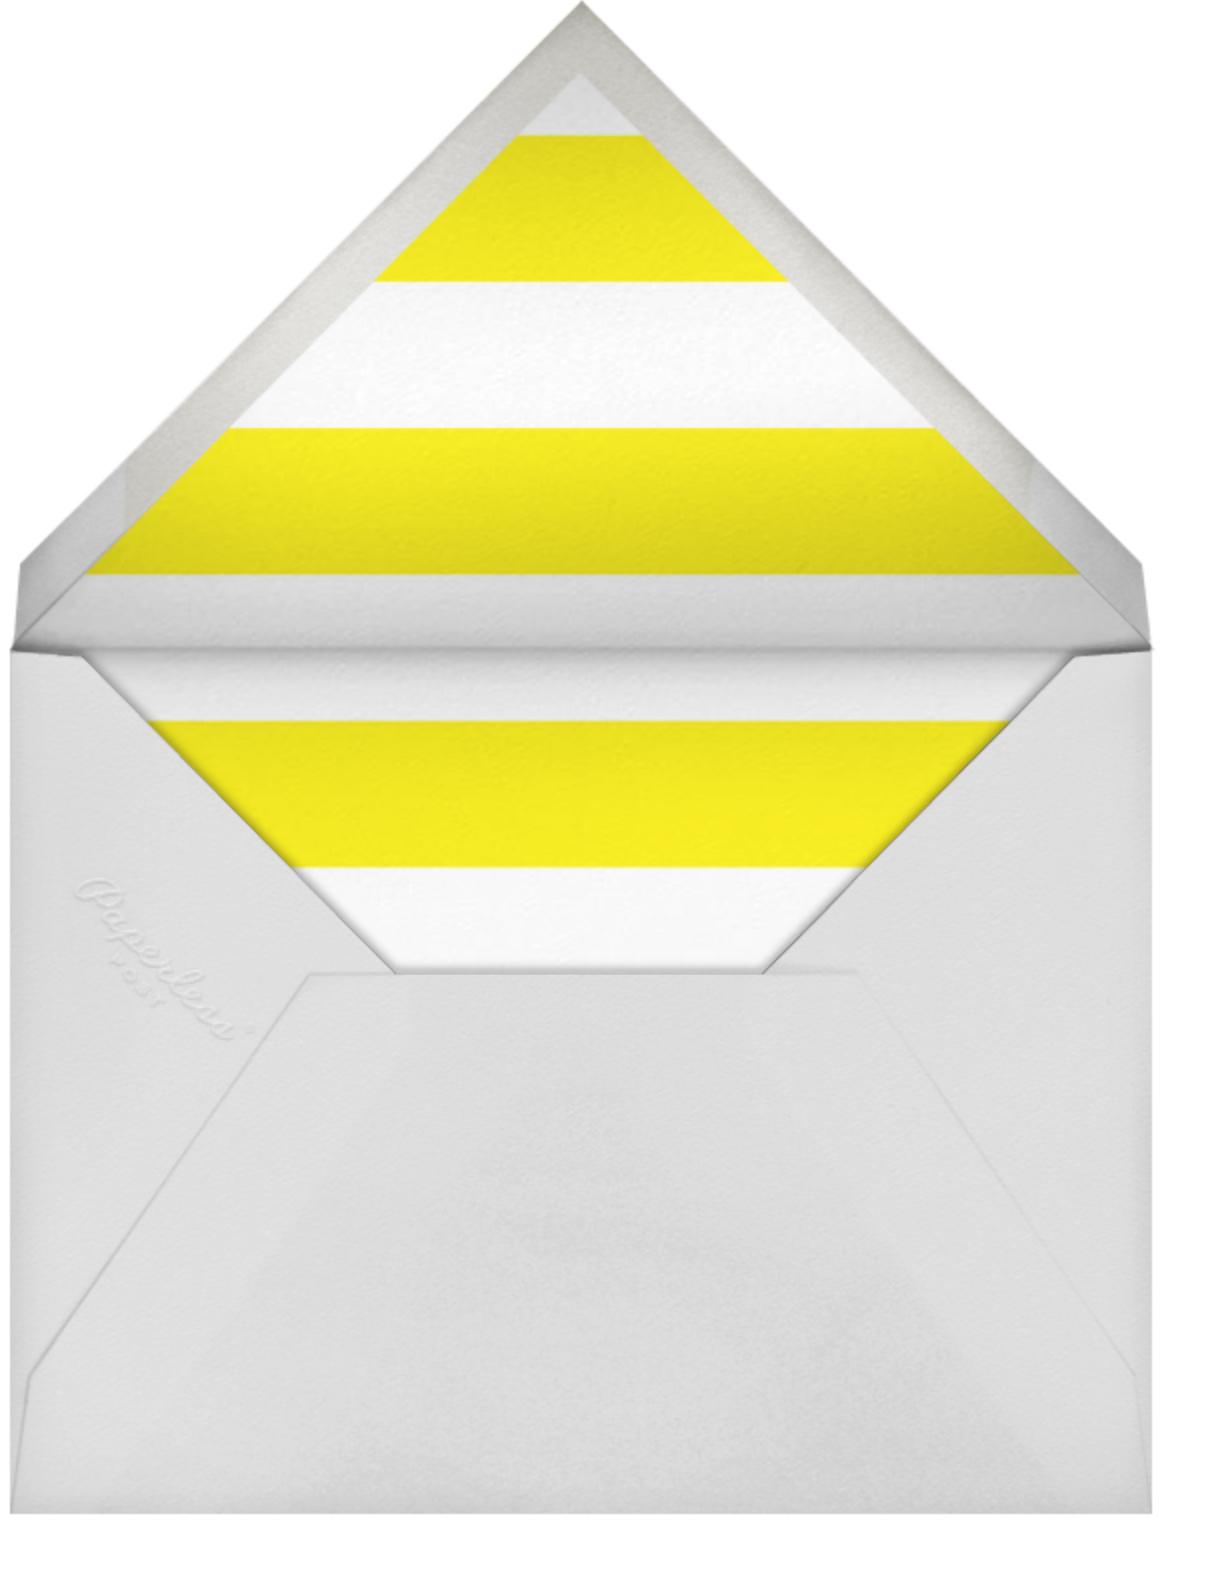 Stripe Suite (Invitation) - Yellow - kate spade new york - All - envelope back